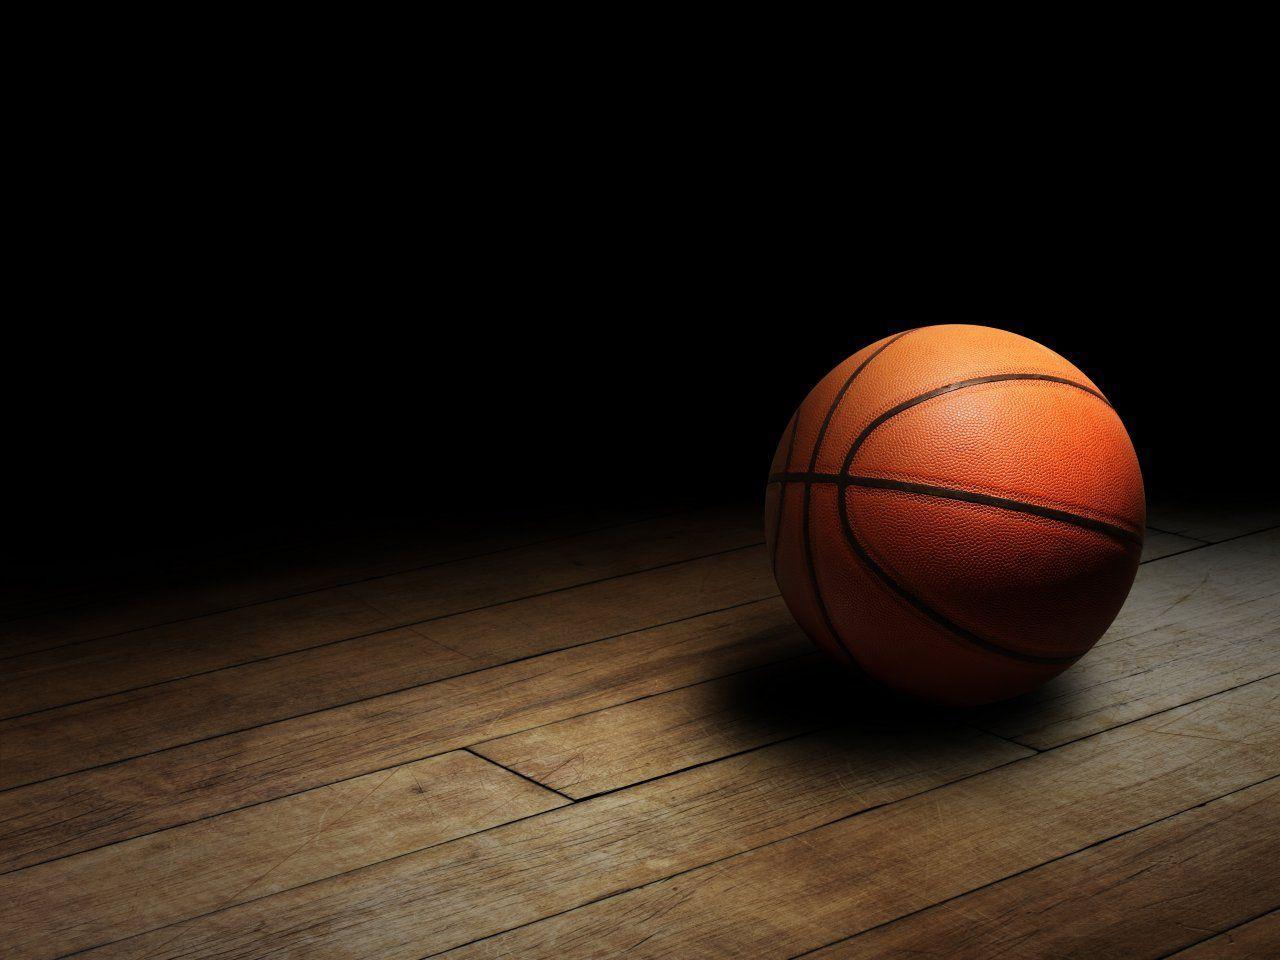 basketball basketball court wood presentation ppt backgrounds